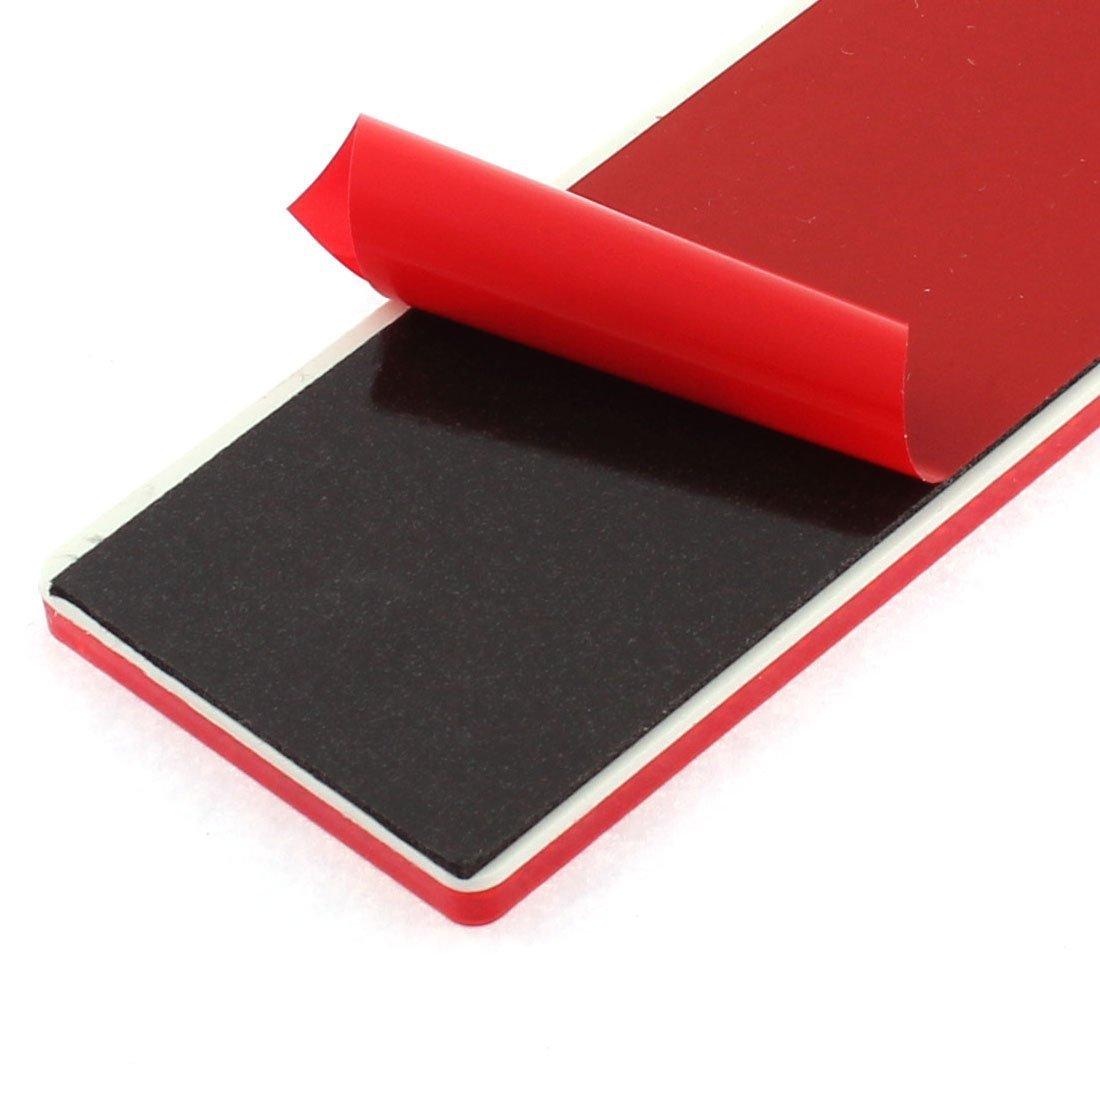 VNDEFUL 5PCS Car Red Reflective Warning Self-adhesive Plate Sticker